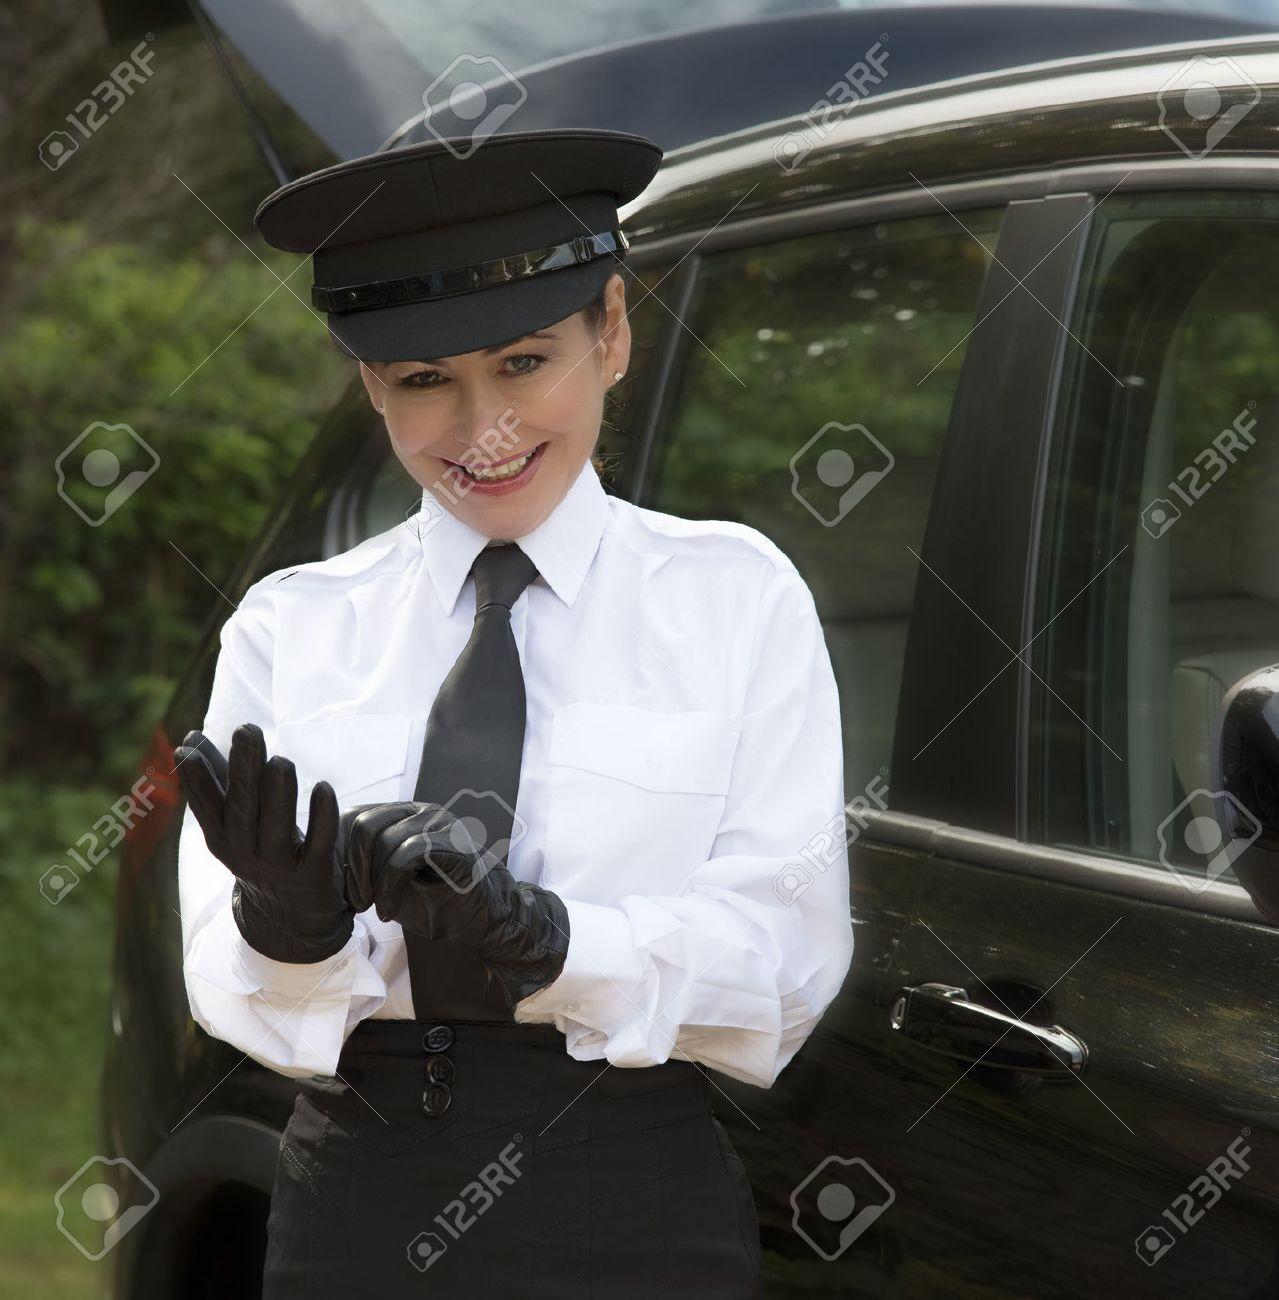 Black leather uniform gloves -